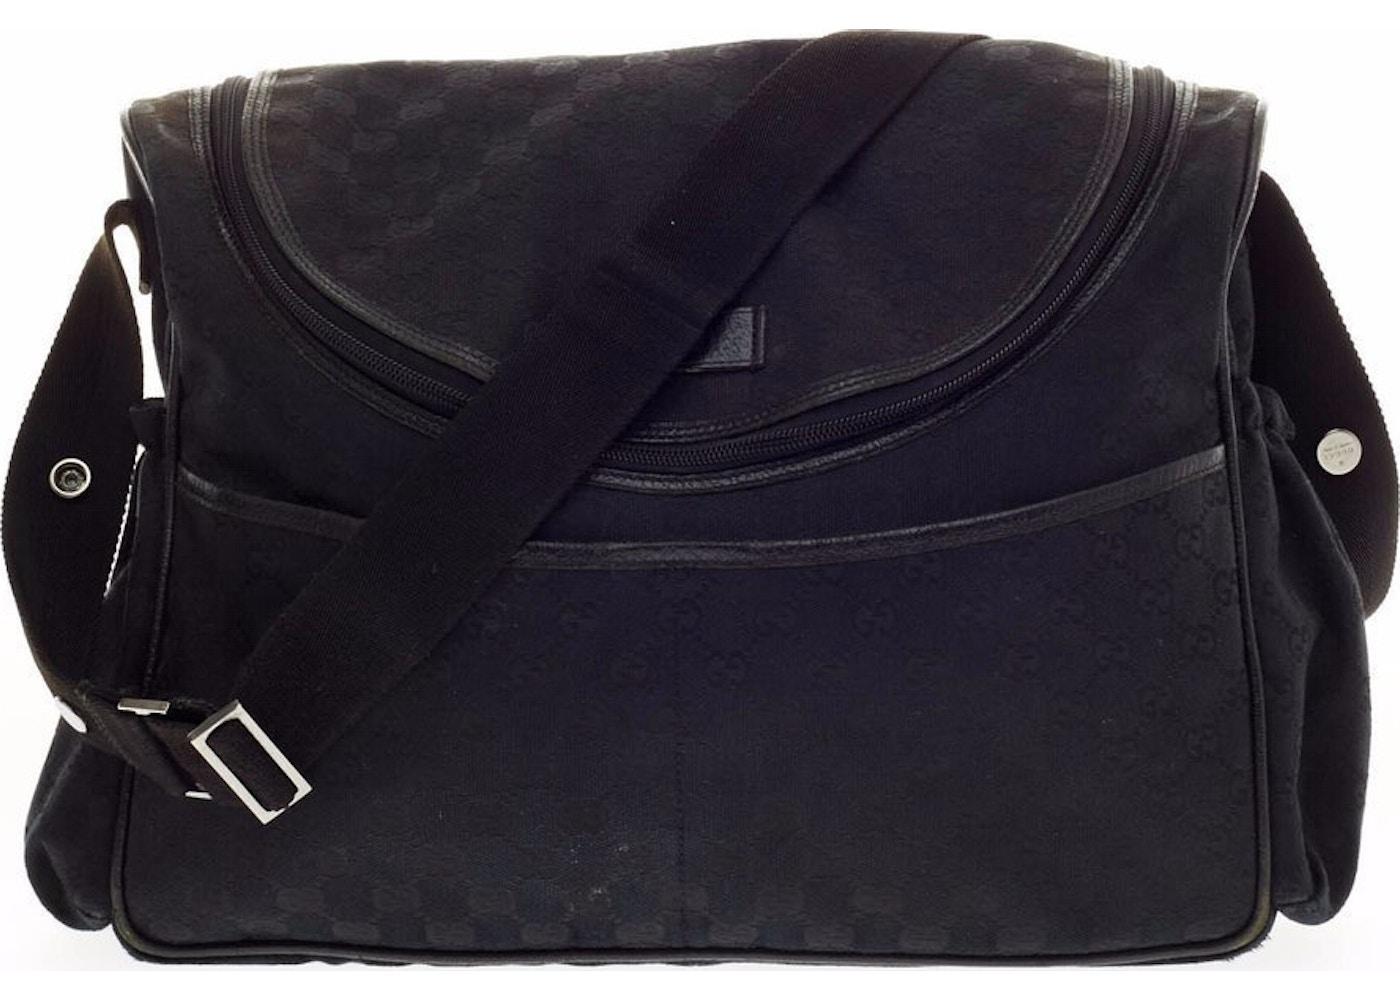 4b9505ca2d57 Gucci Diaper Bag Crossbody GG Black. GG Black